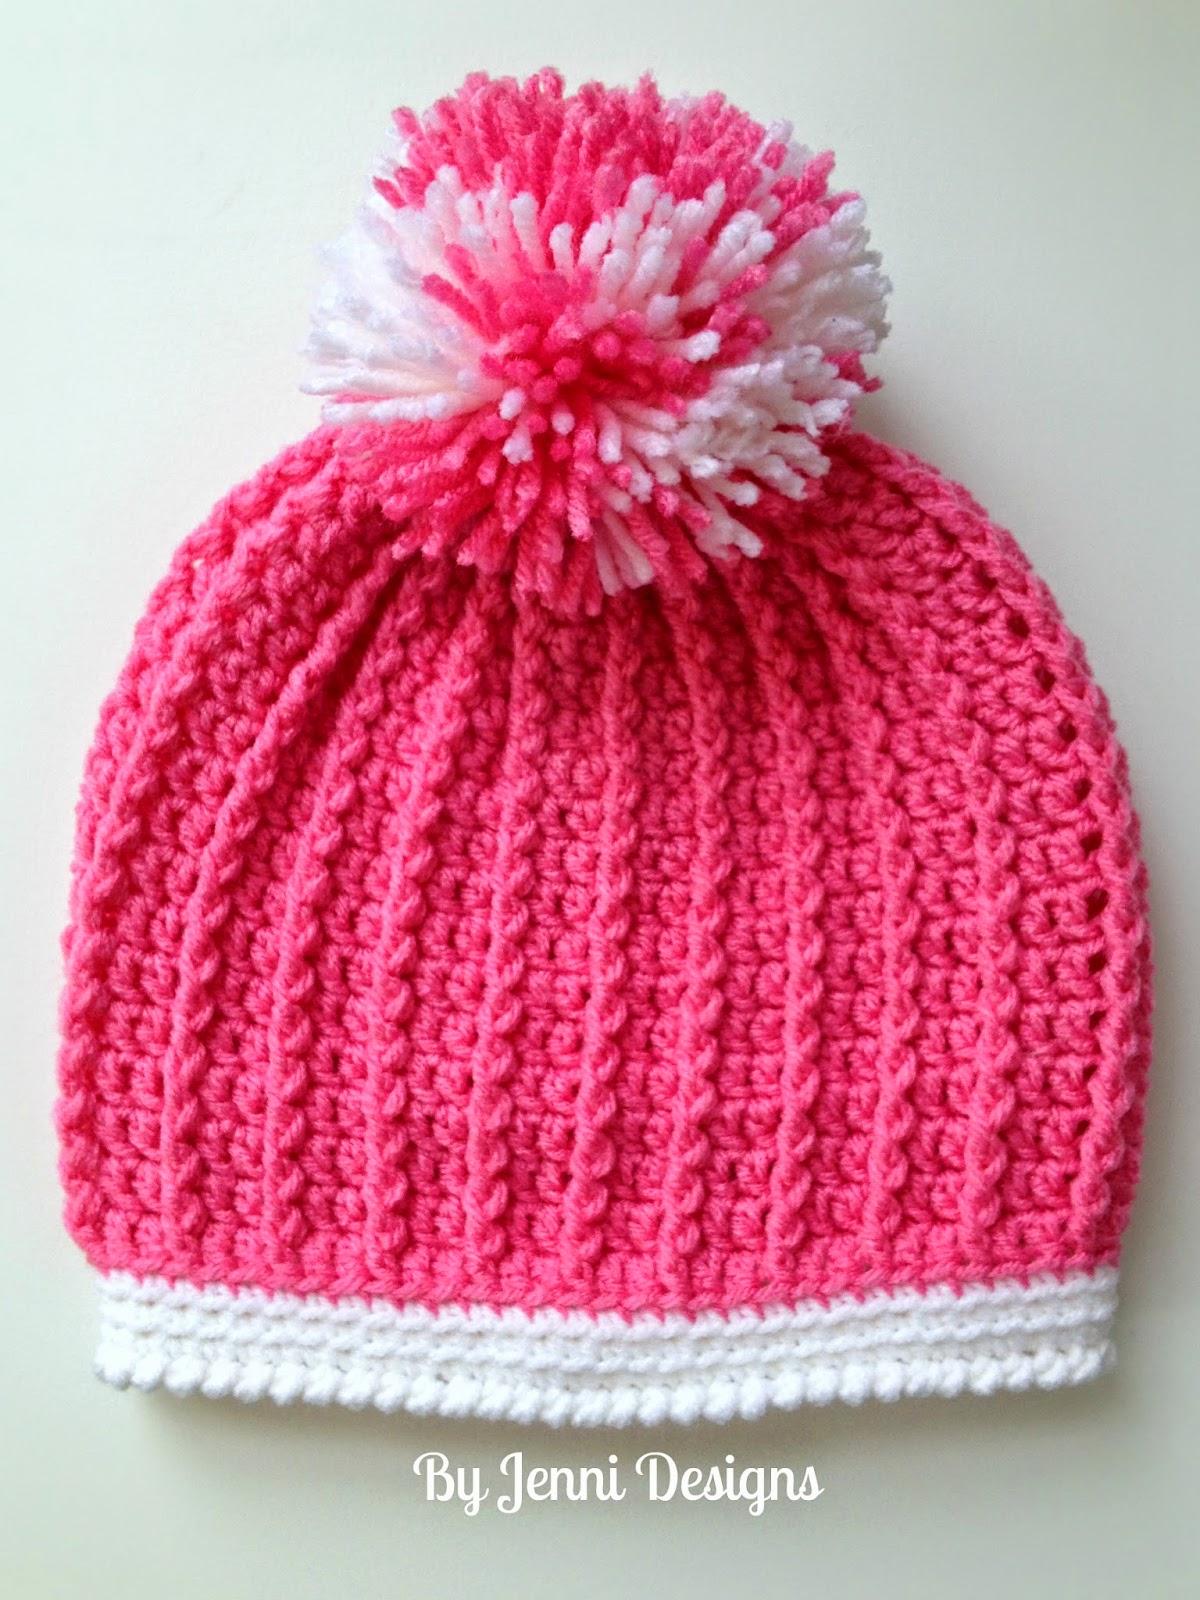 By Jenni Designs: Free Crochet Pattern: Ribbed Pre-School Size Hat